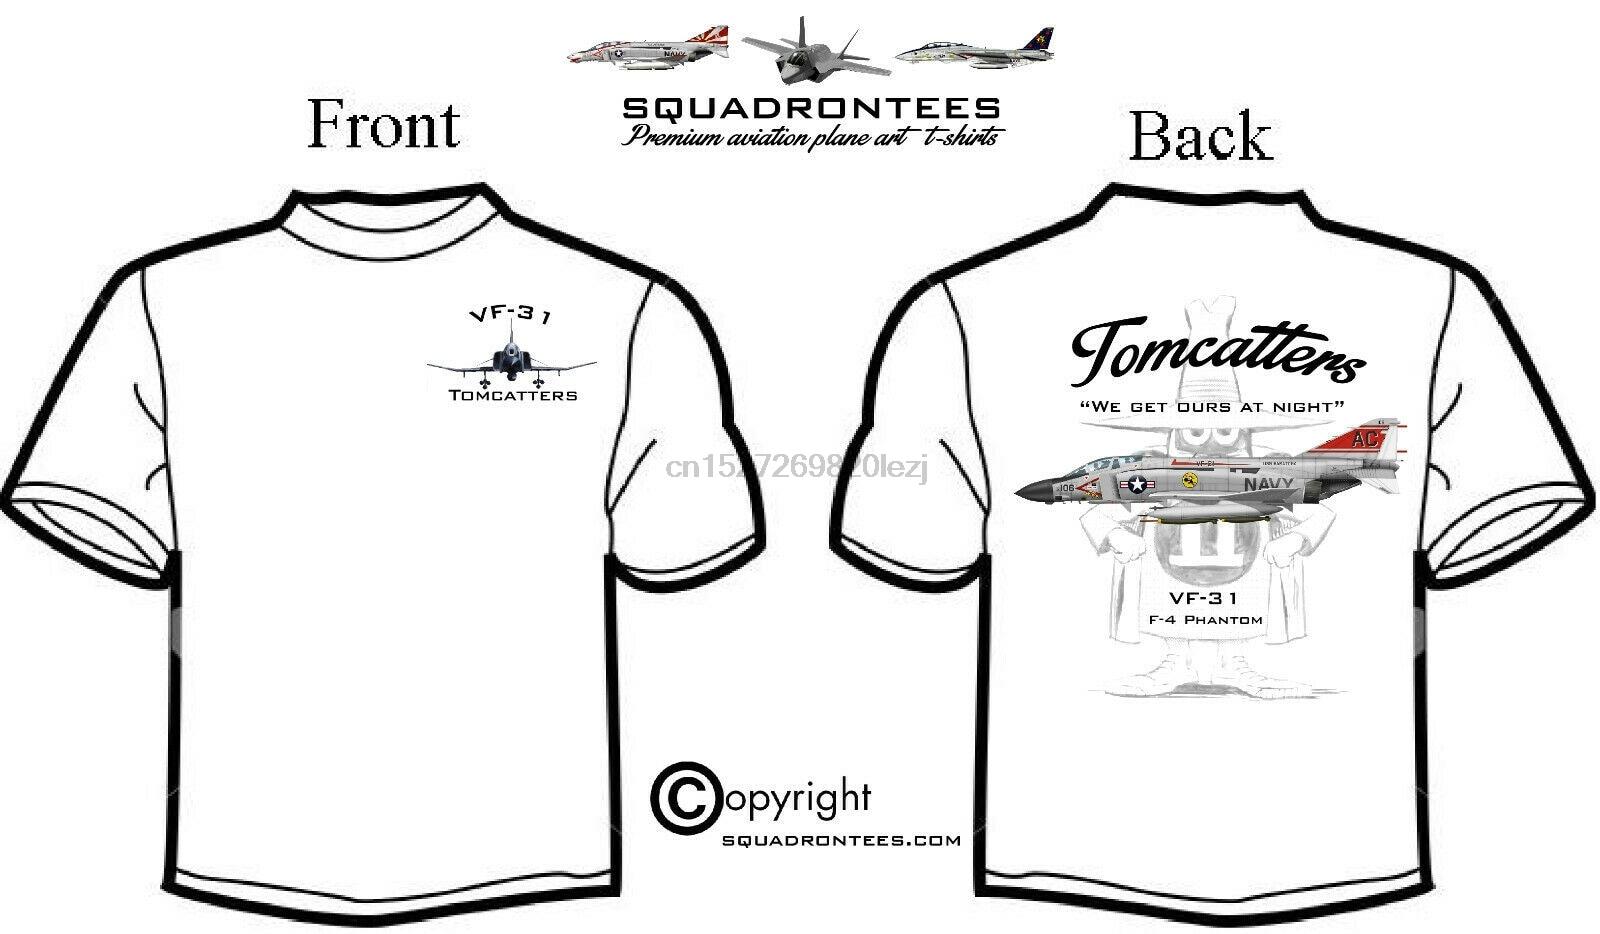 Vf 31 Tomcatters F 4 escuadrón fantasma T camisa Premium arte